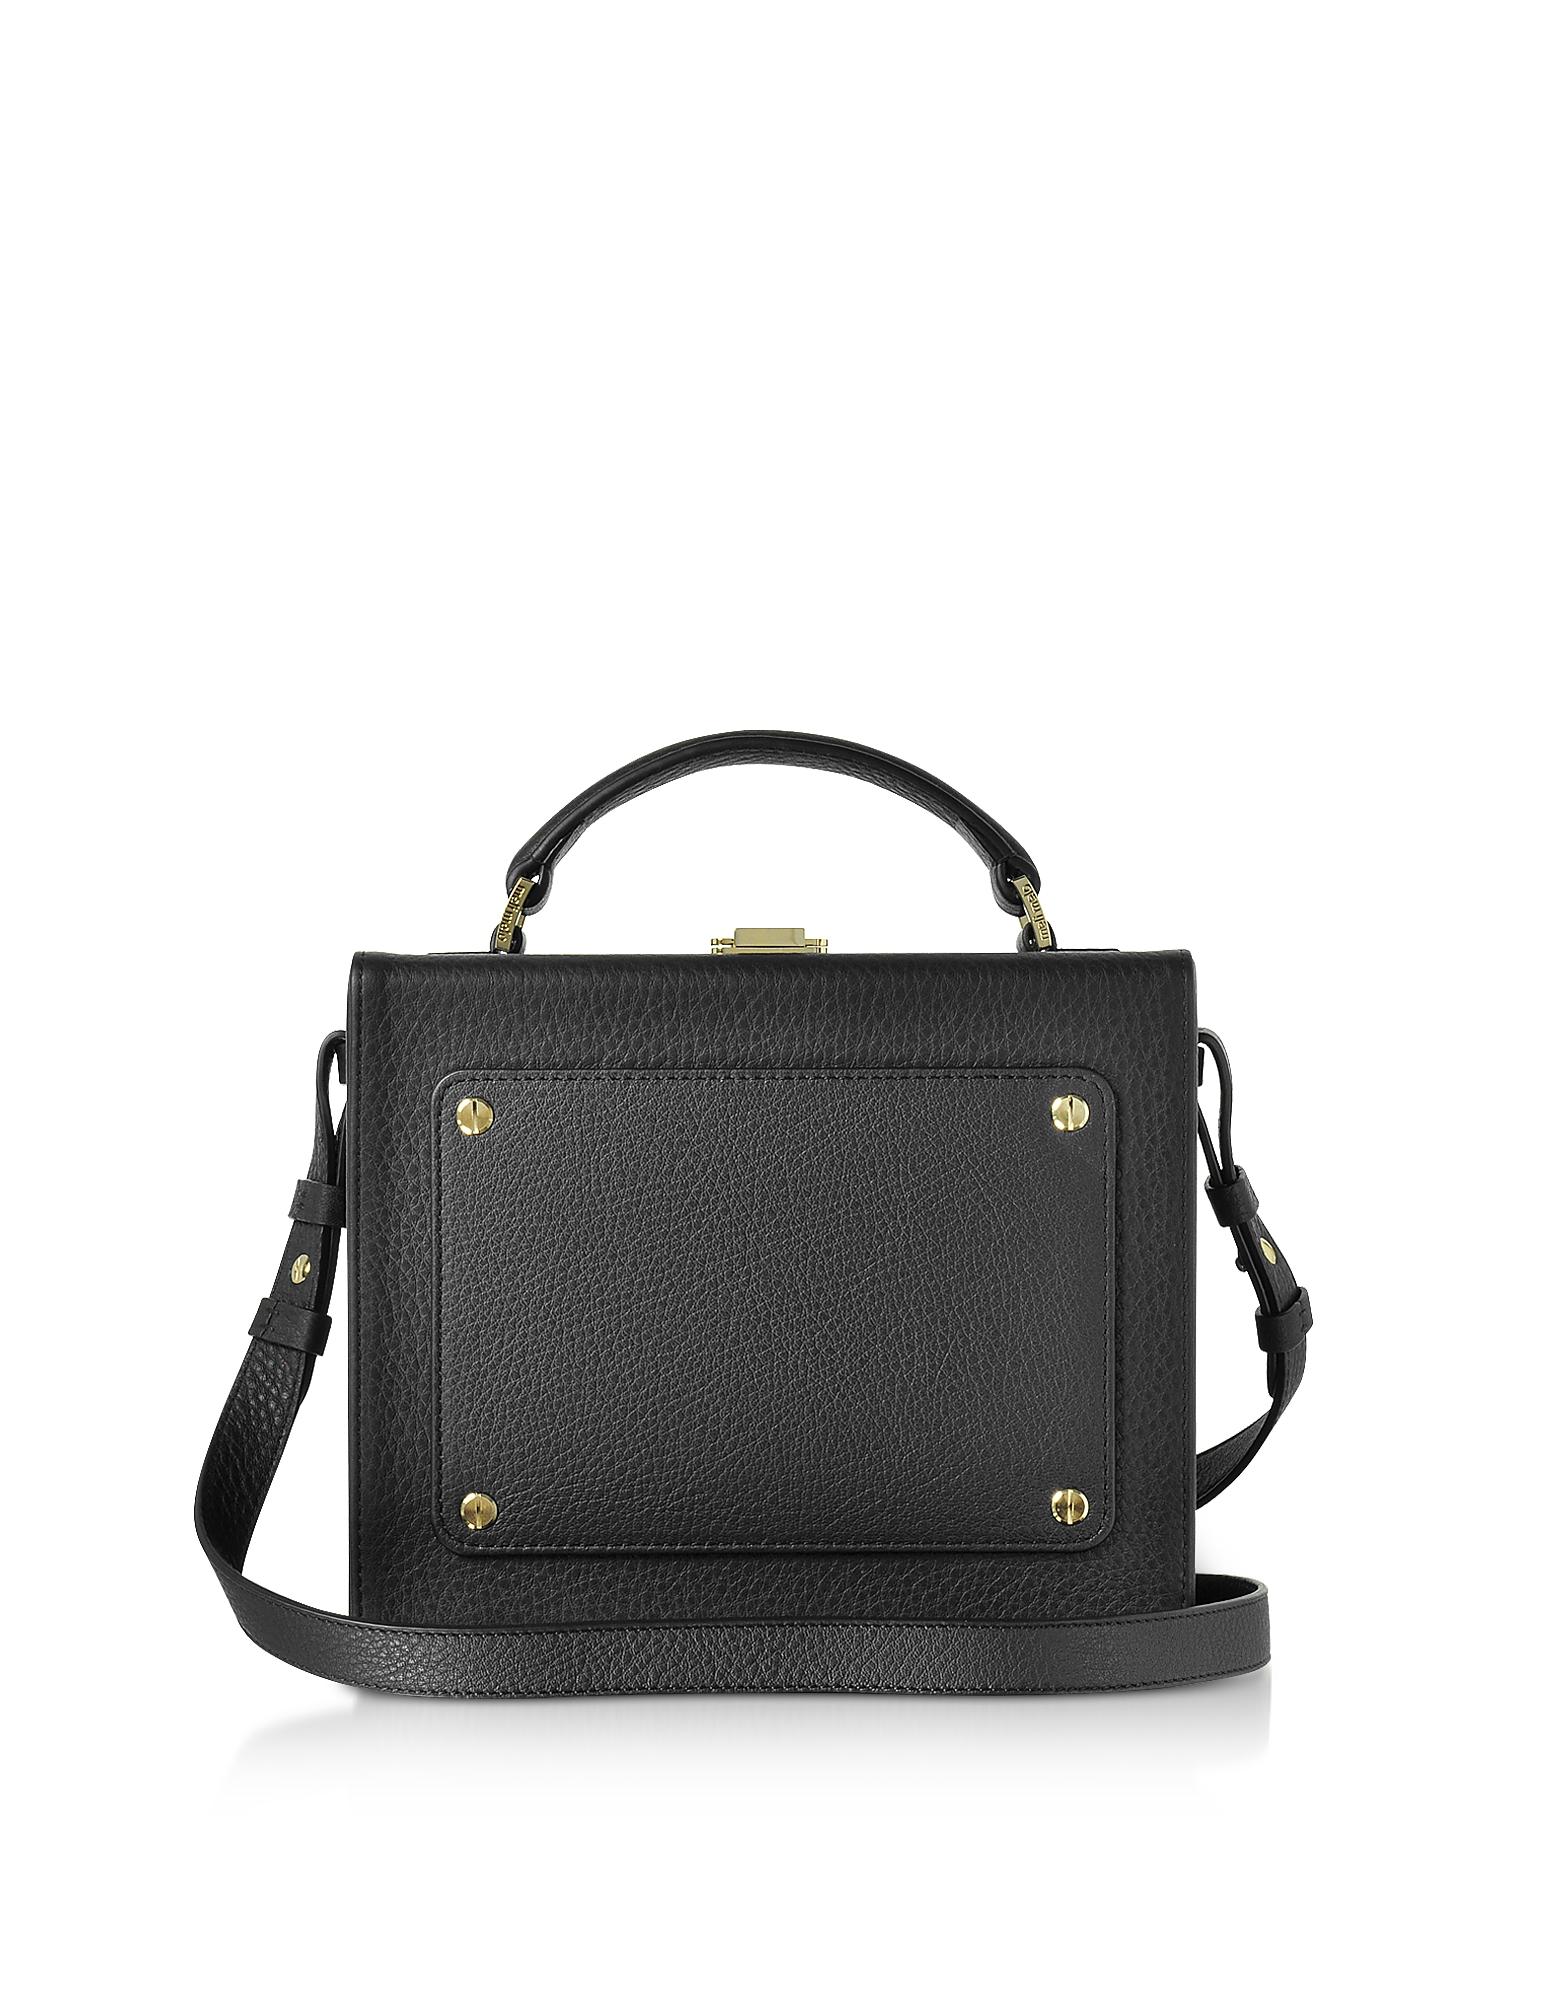 Black Leather Art Bag